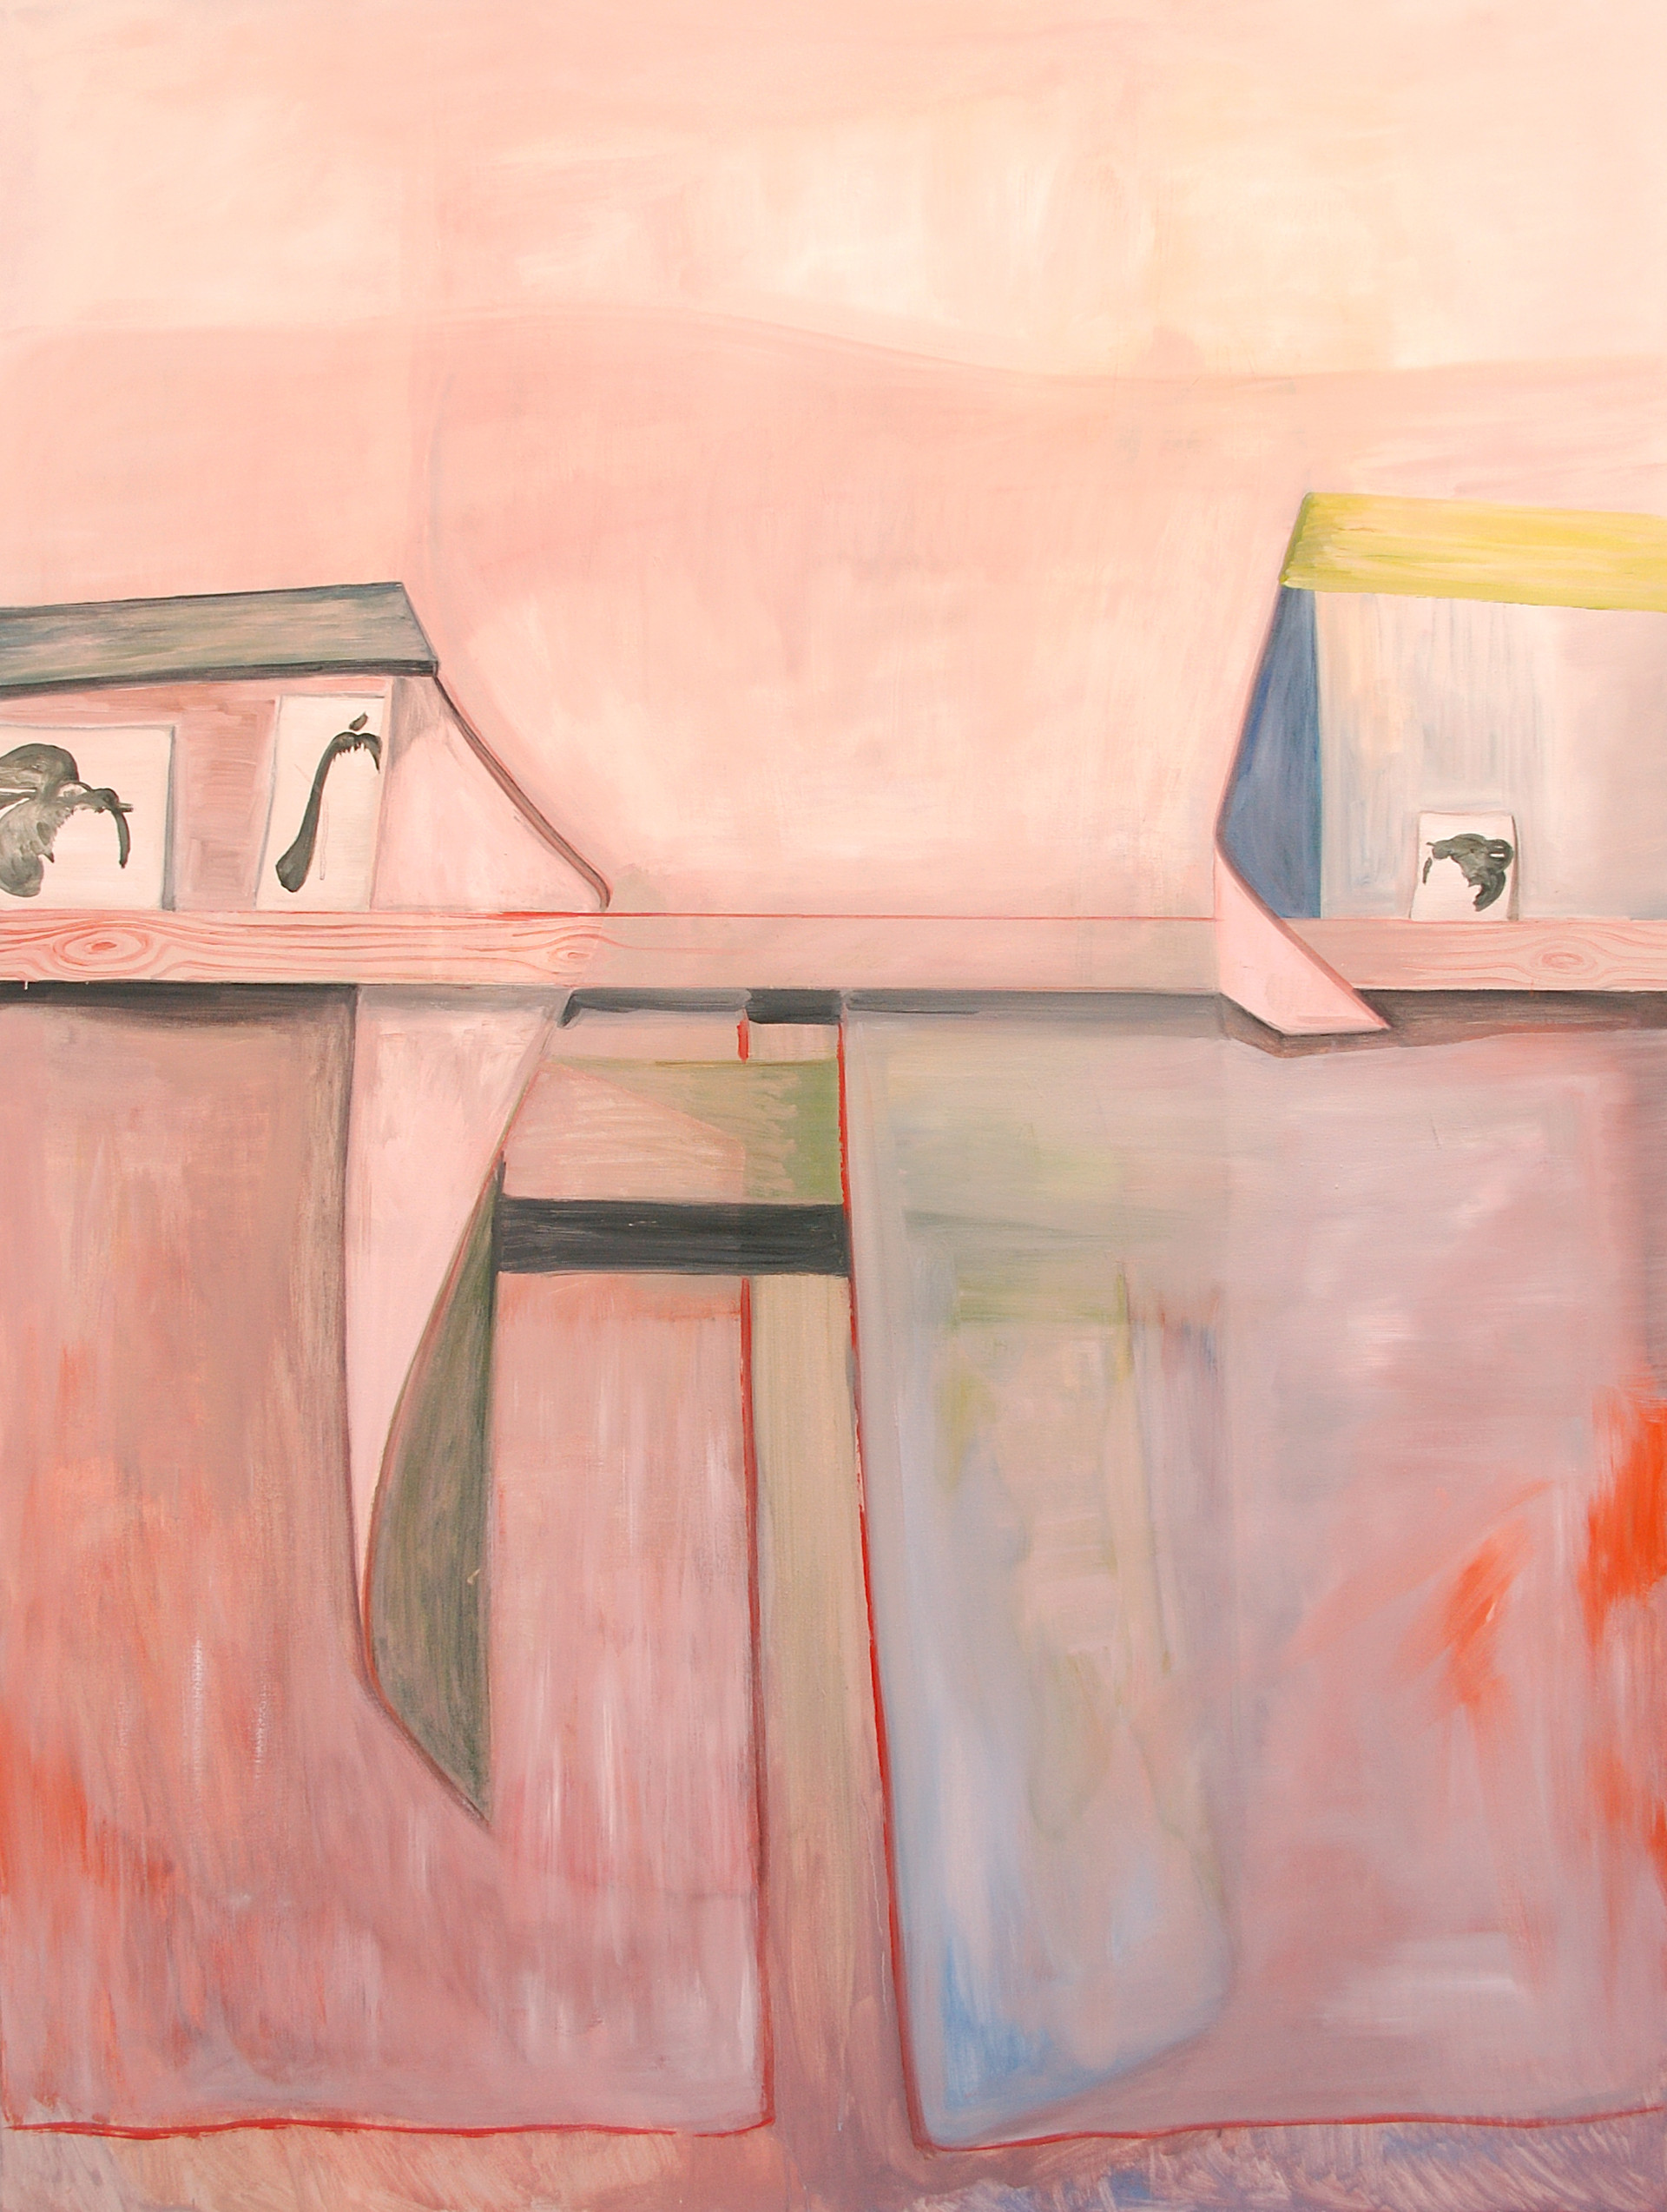 menagerie - 2008 - öl auf leinwand - 160 x 120 cm